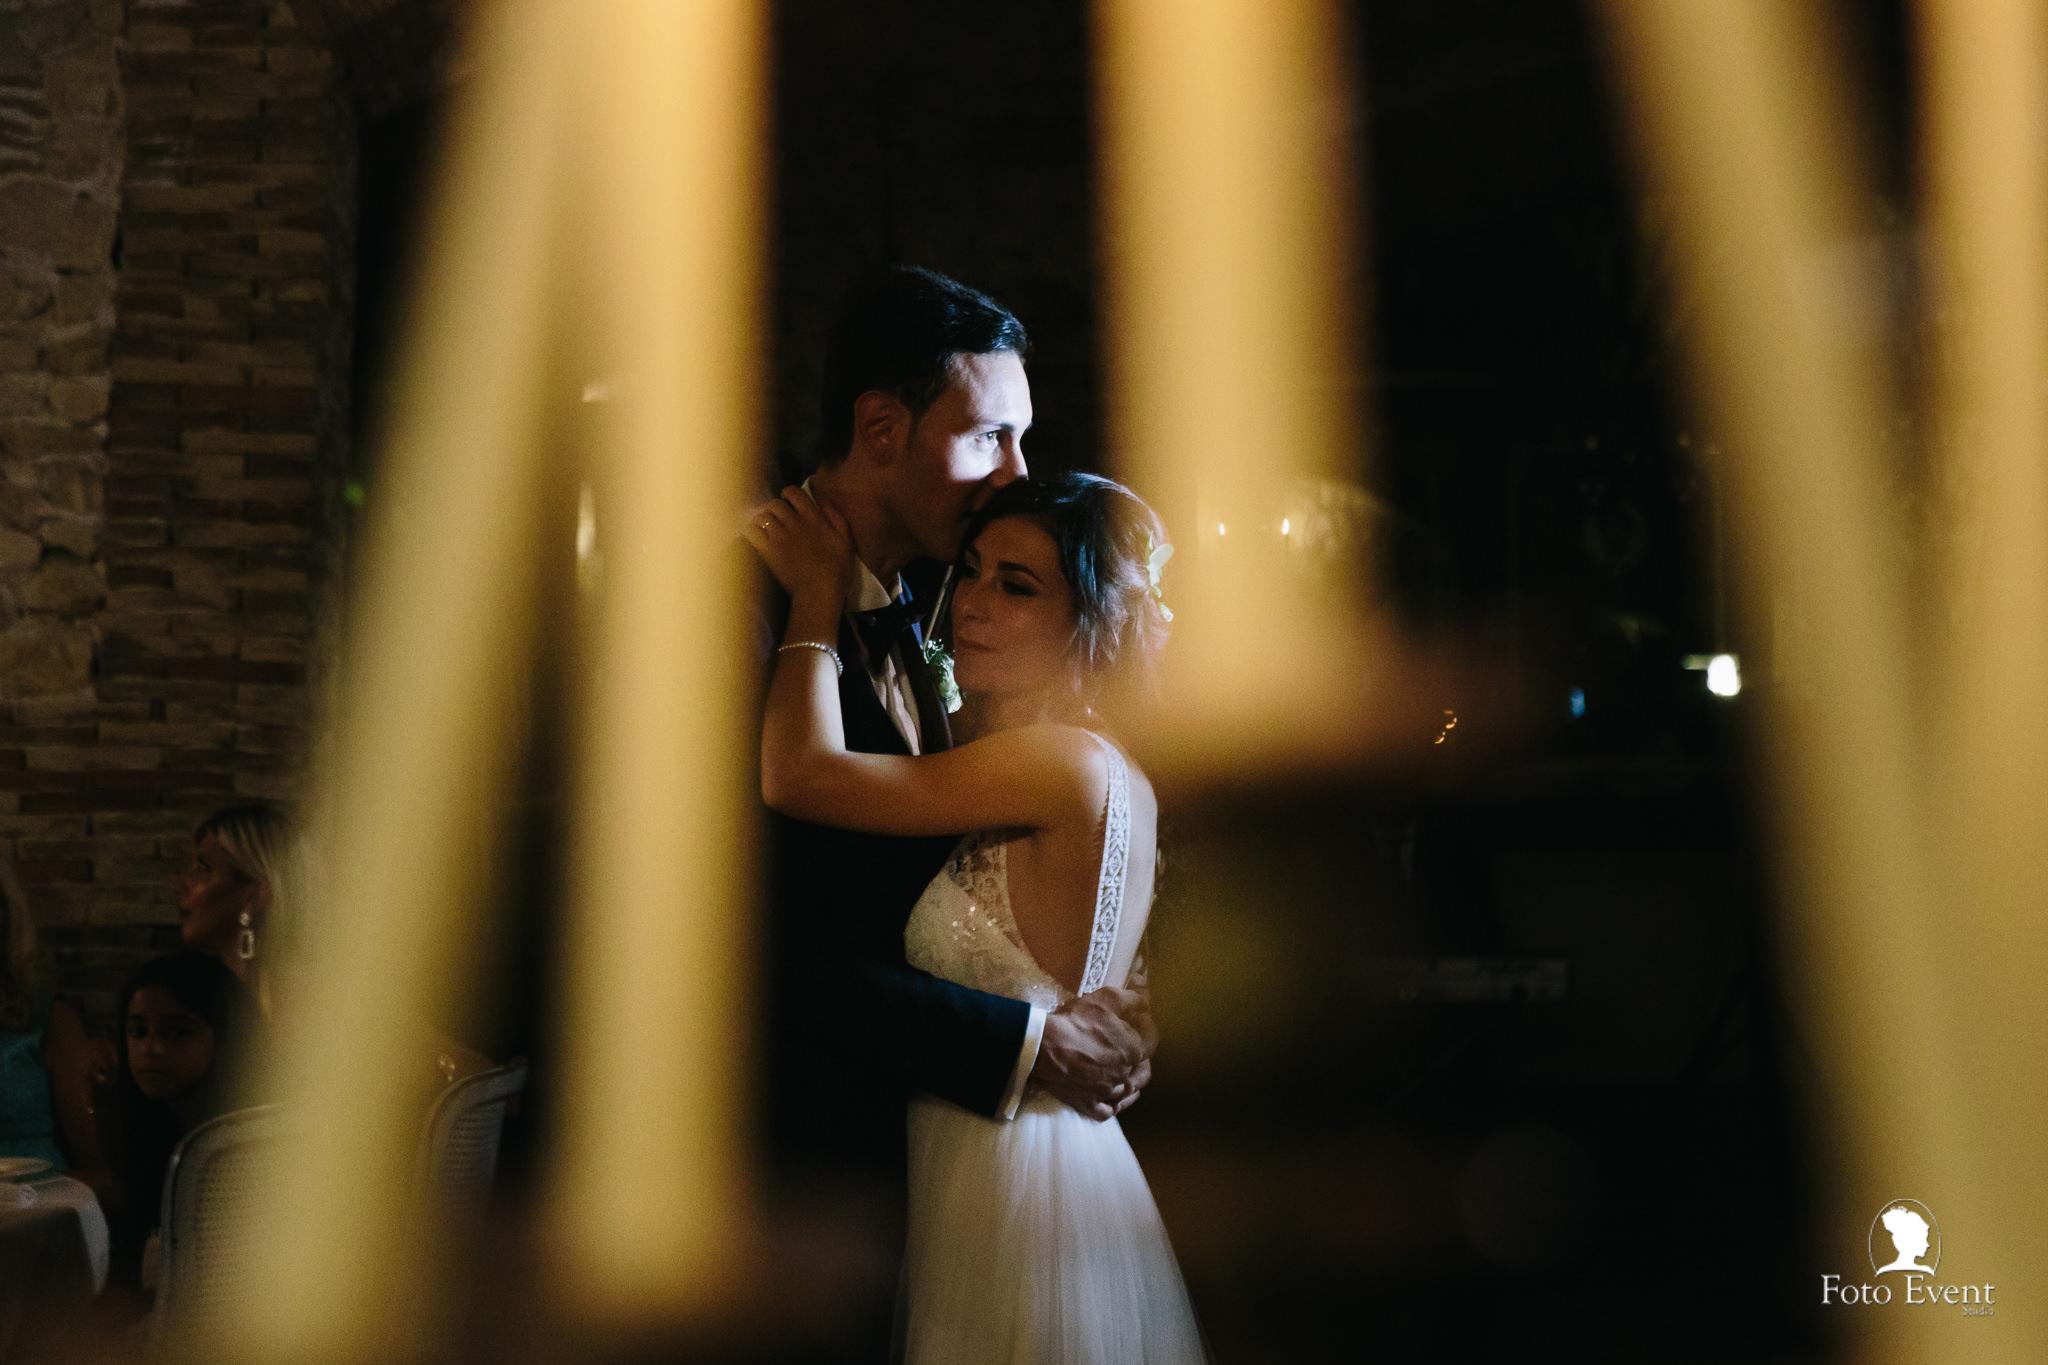 042-2019-08-23-Matrimonio-Lucia-e-Rosario-Scopelliti-5DE-2131